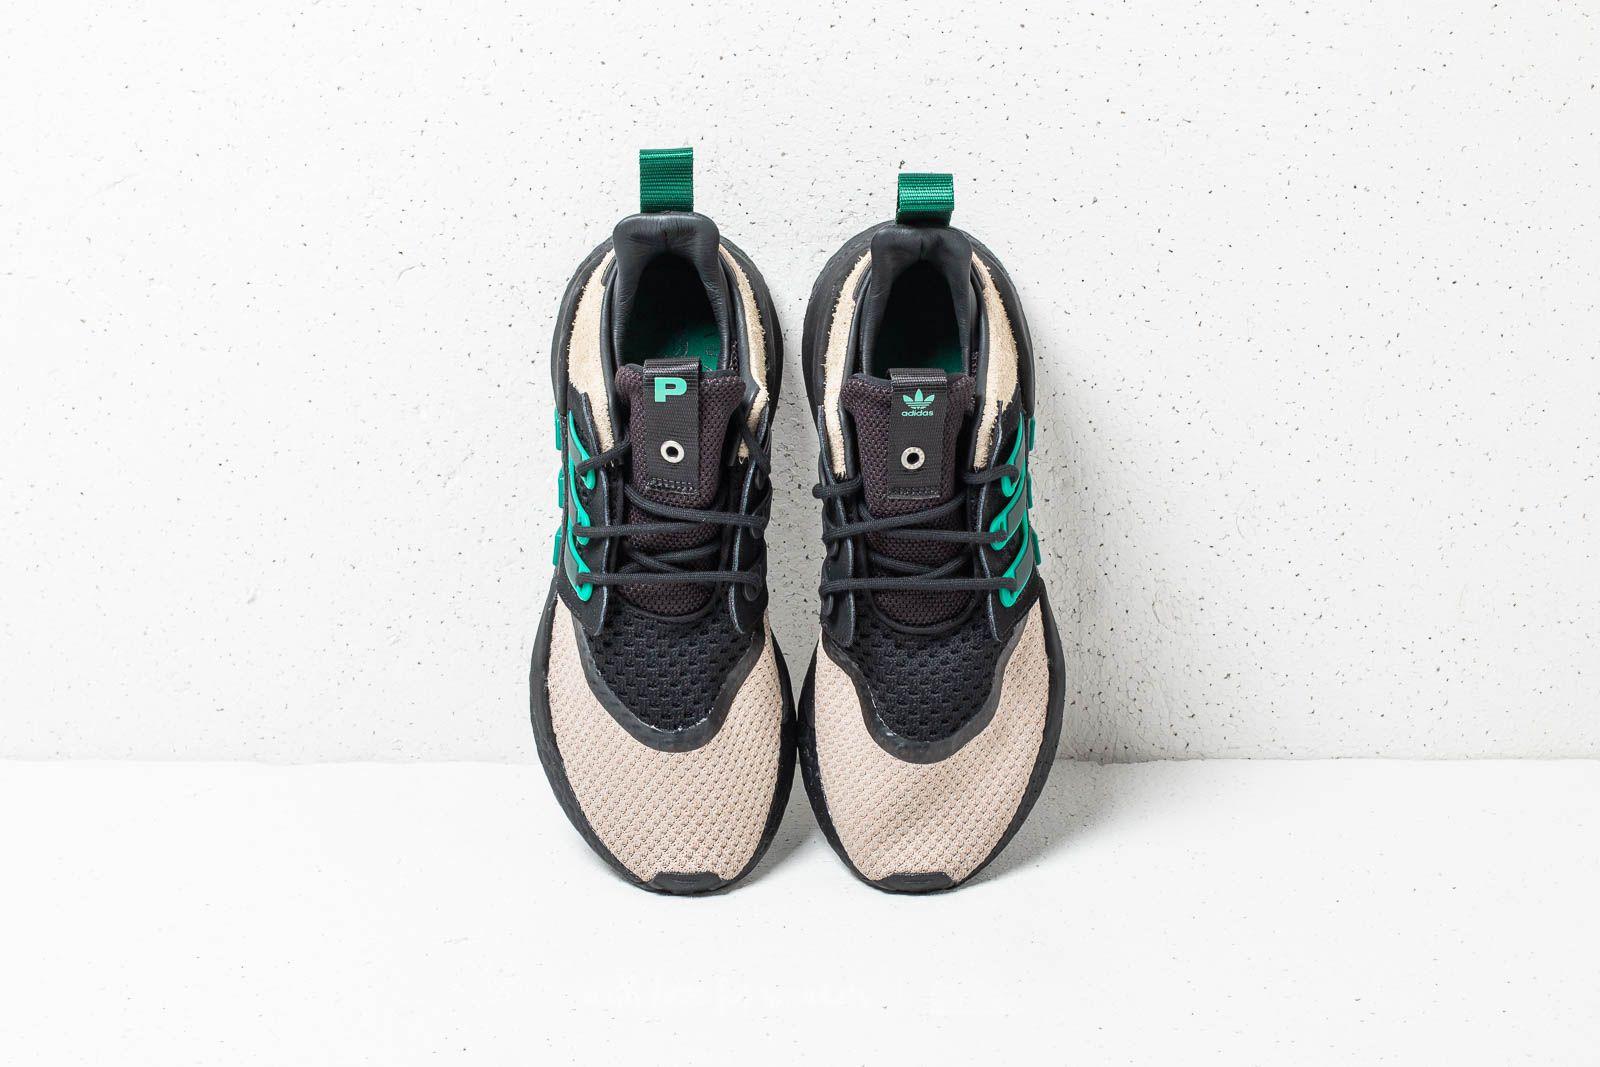 san francisco d30b9 d4681 adidas EQT 91/18 Packer Core Black/ Sub Green/ Blacar   Footshop